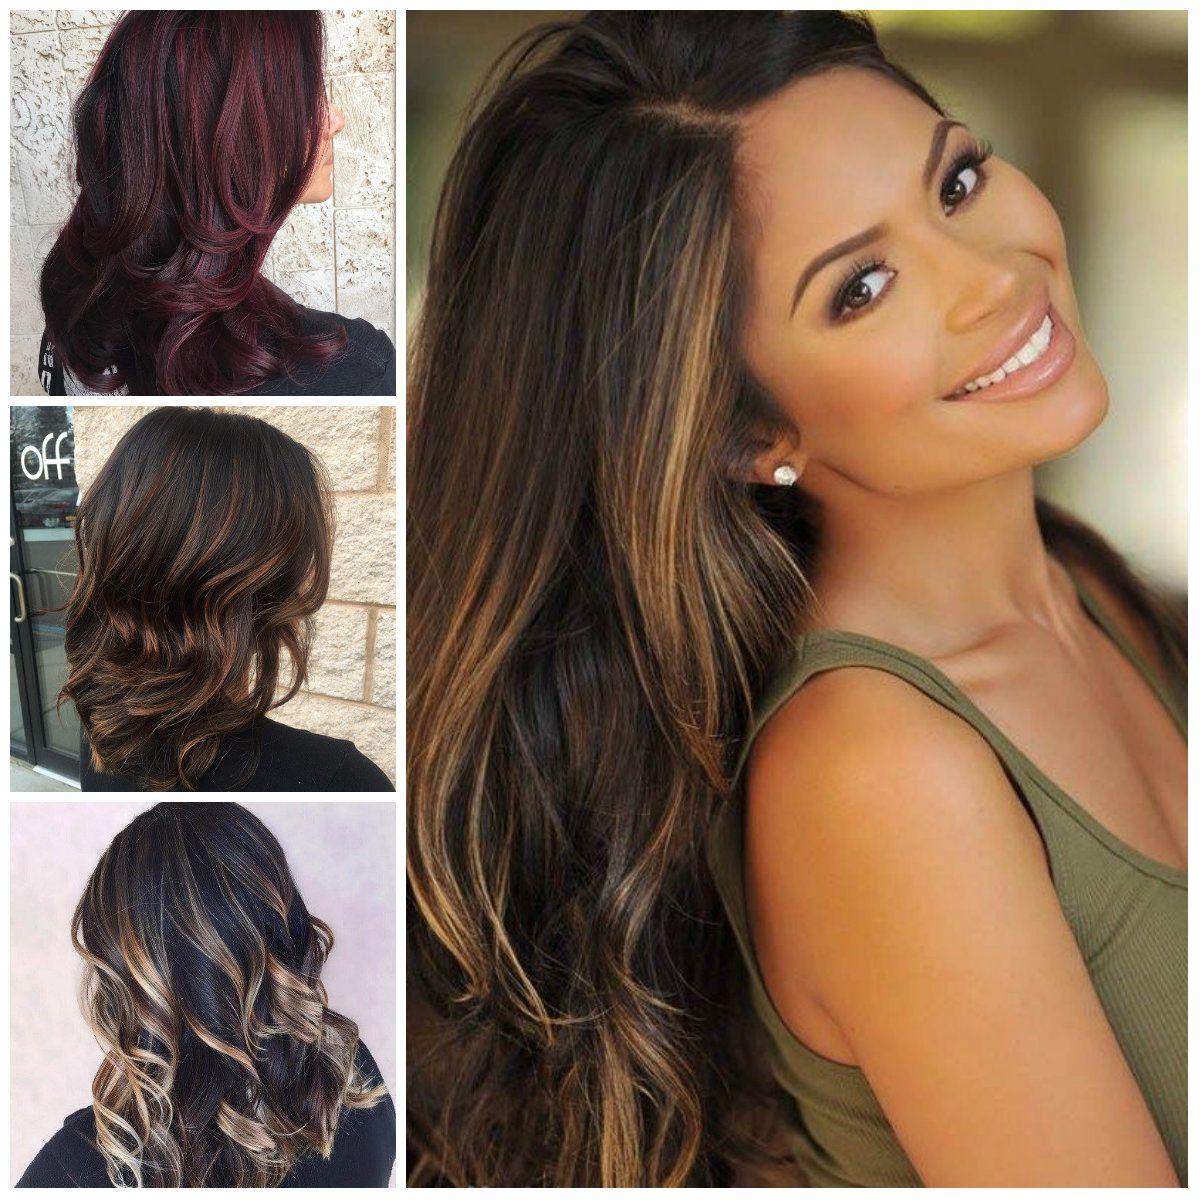 Hair Color Highlights For Dark Brown Hair Best Hair Color For Dark Skin Women Check More At Http Frenzyhairstudio Com Hair Color Highlights For Dark Brown H